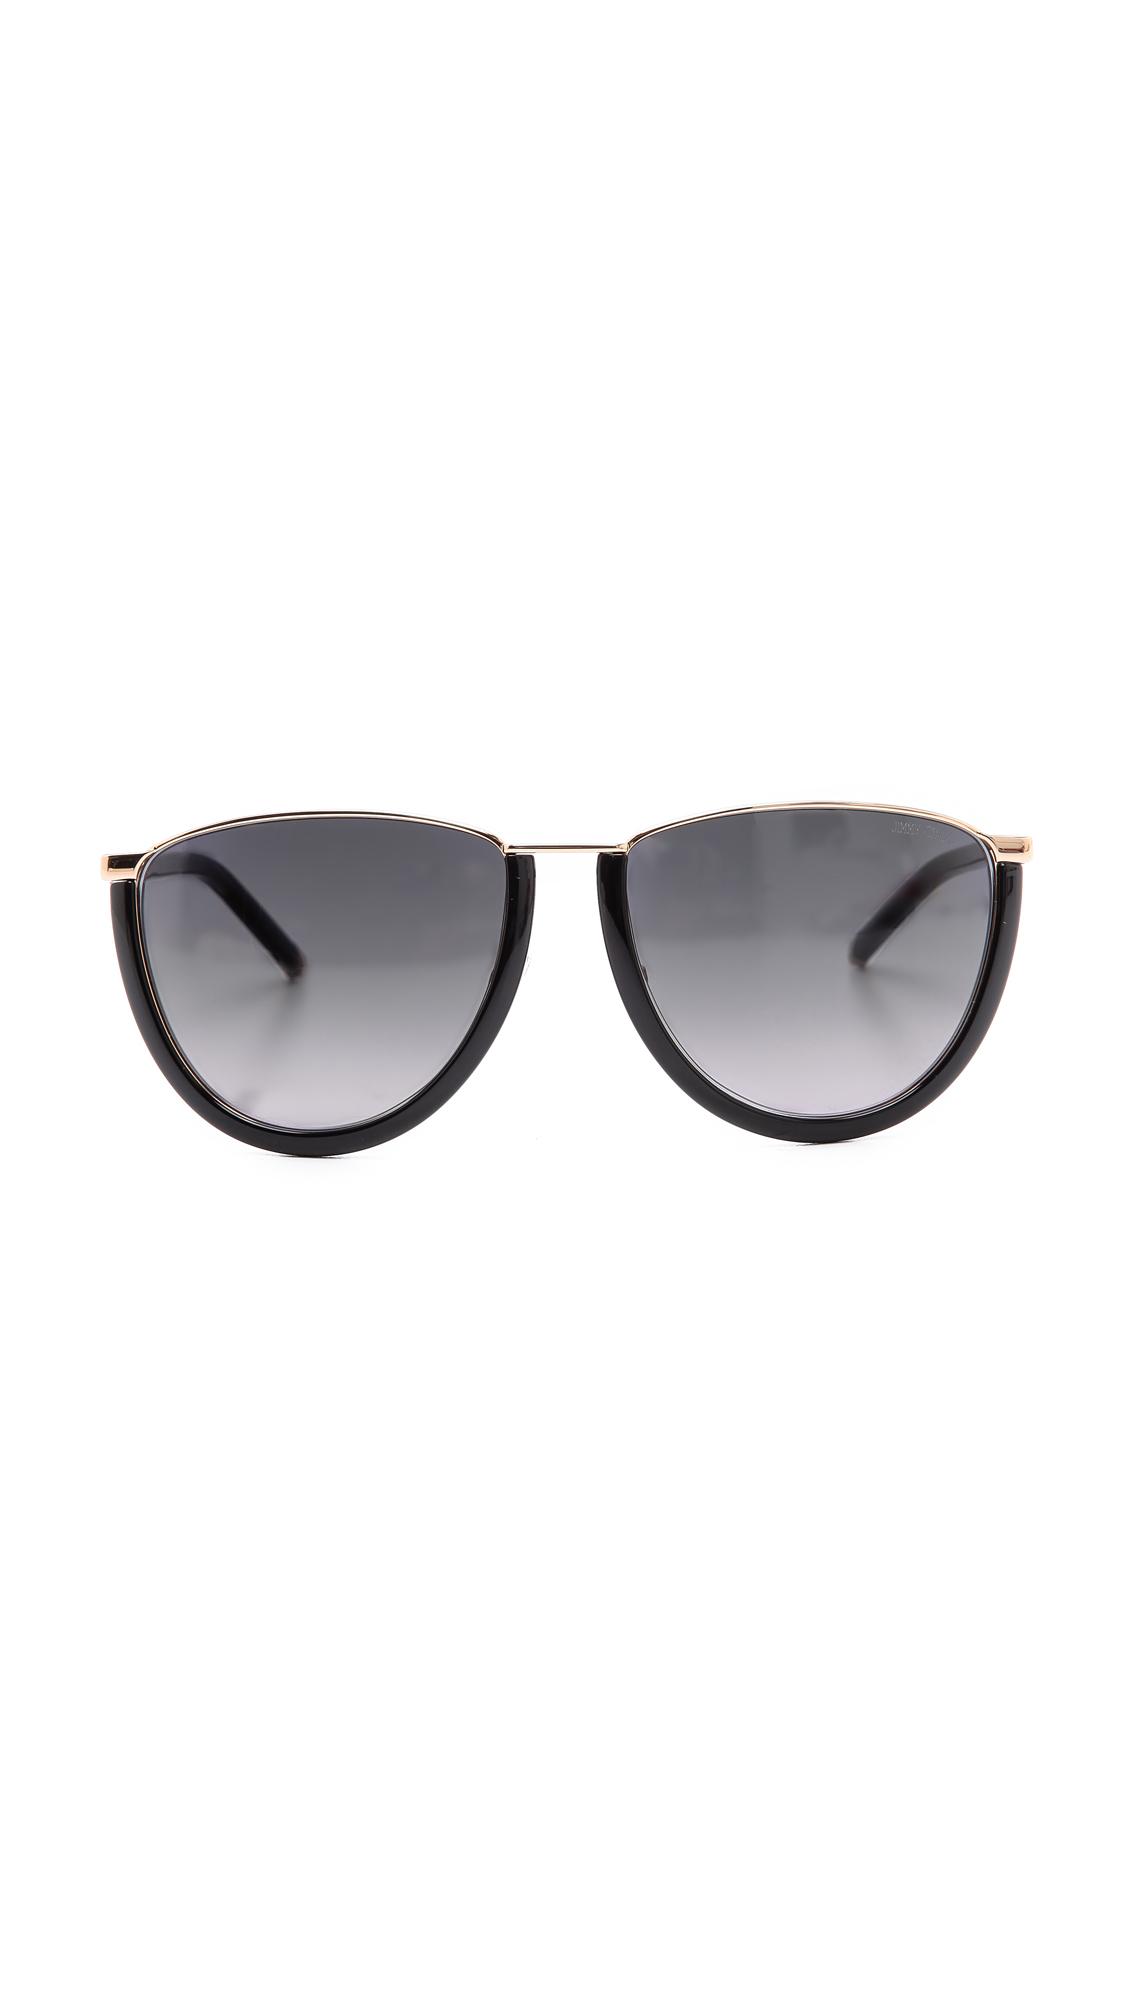 Jimmy Choo Mila Sunglasses - Rose Gold/Black/Grey Gradient